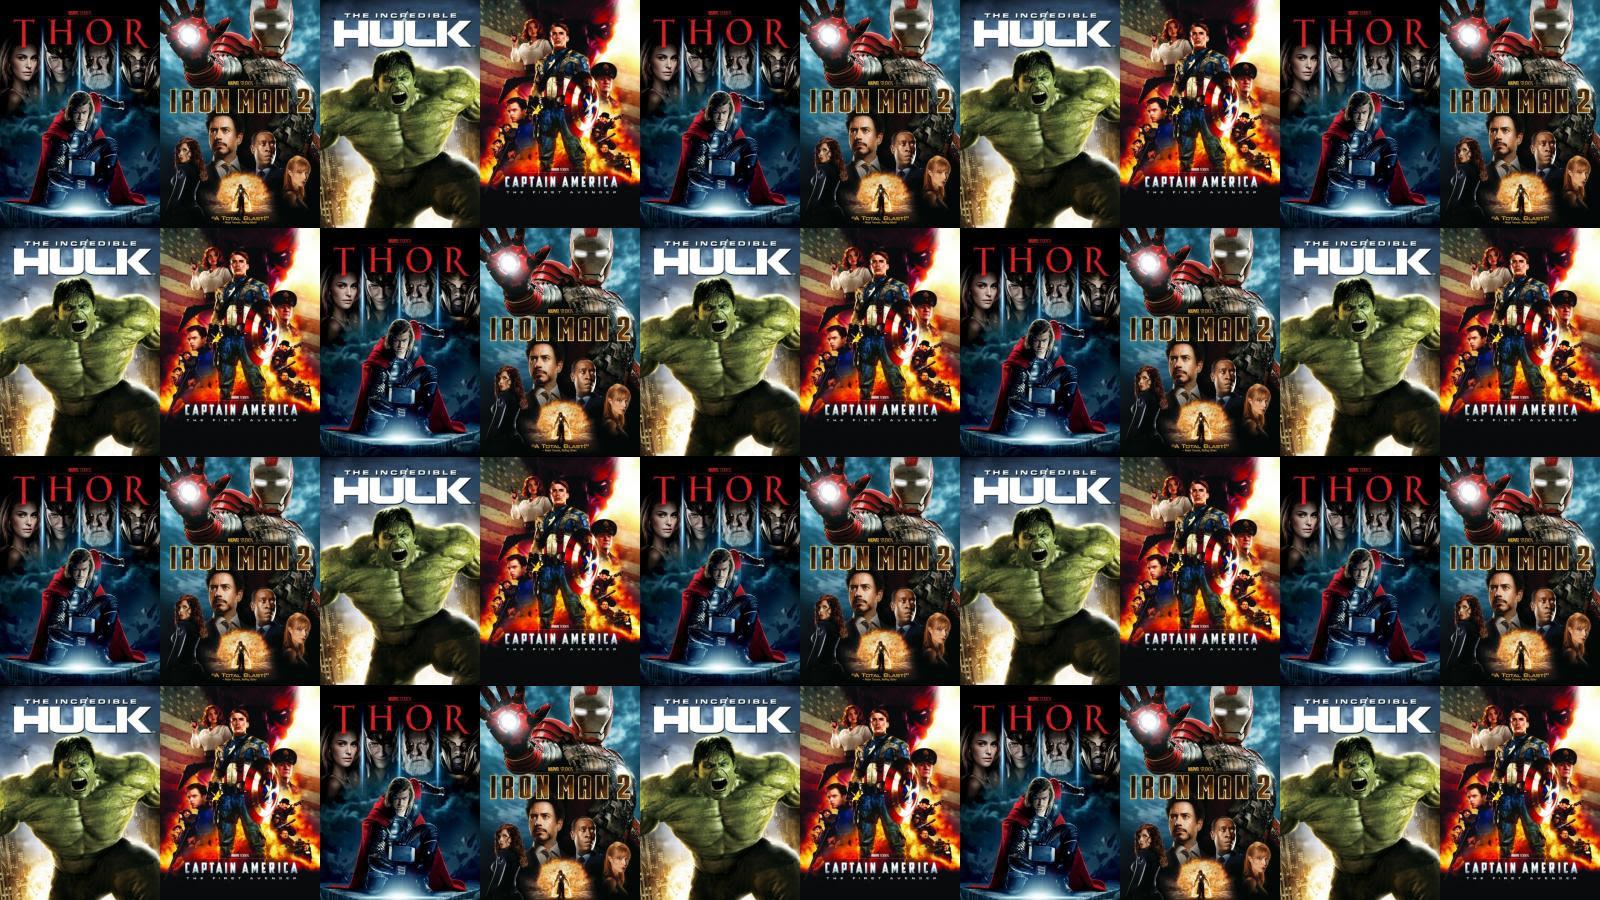 Thor Iron Man 2 The Hulk Captain America Wallpaper Tiled Desktop